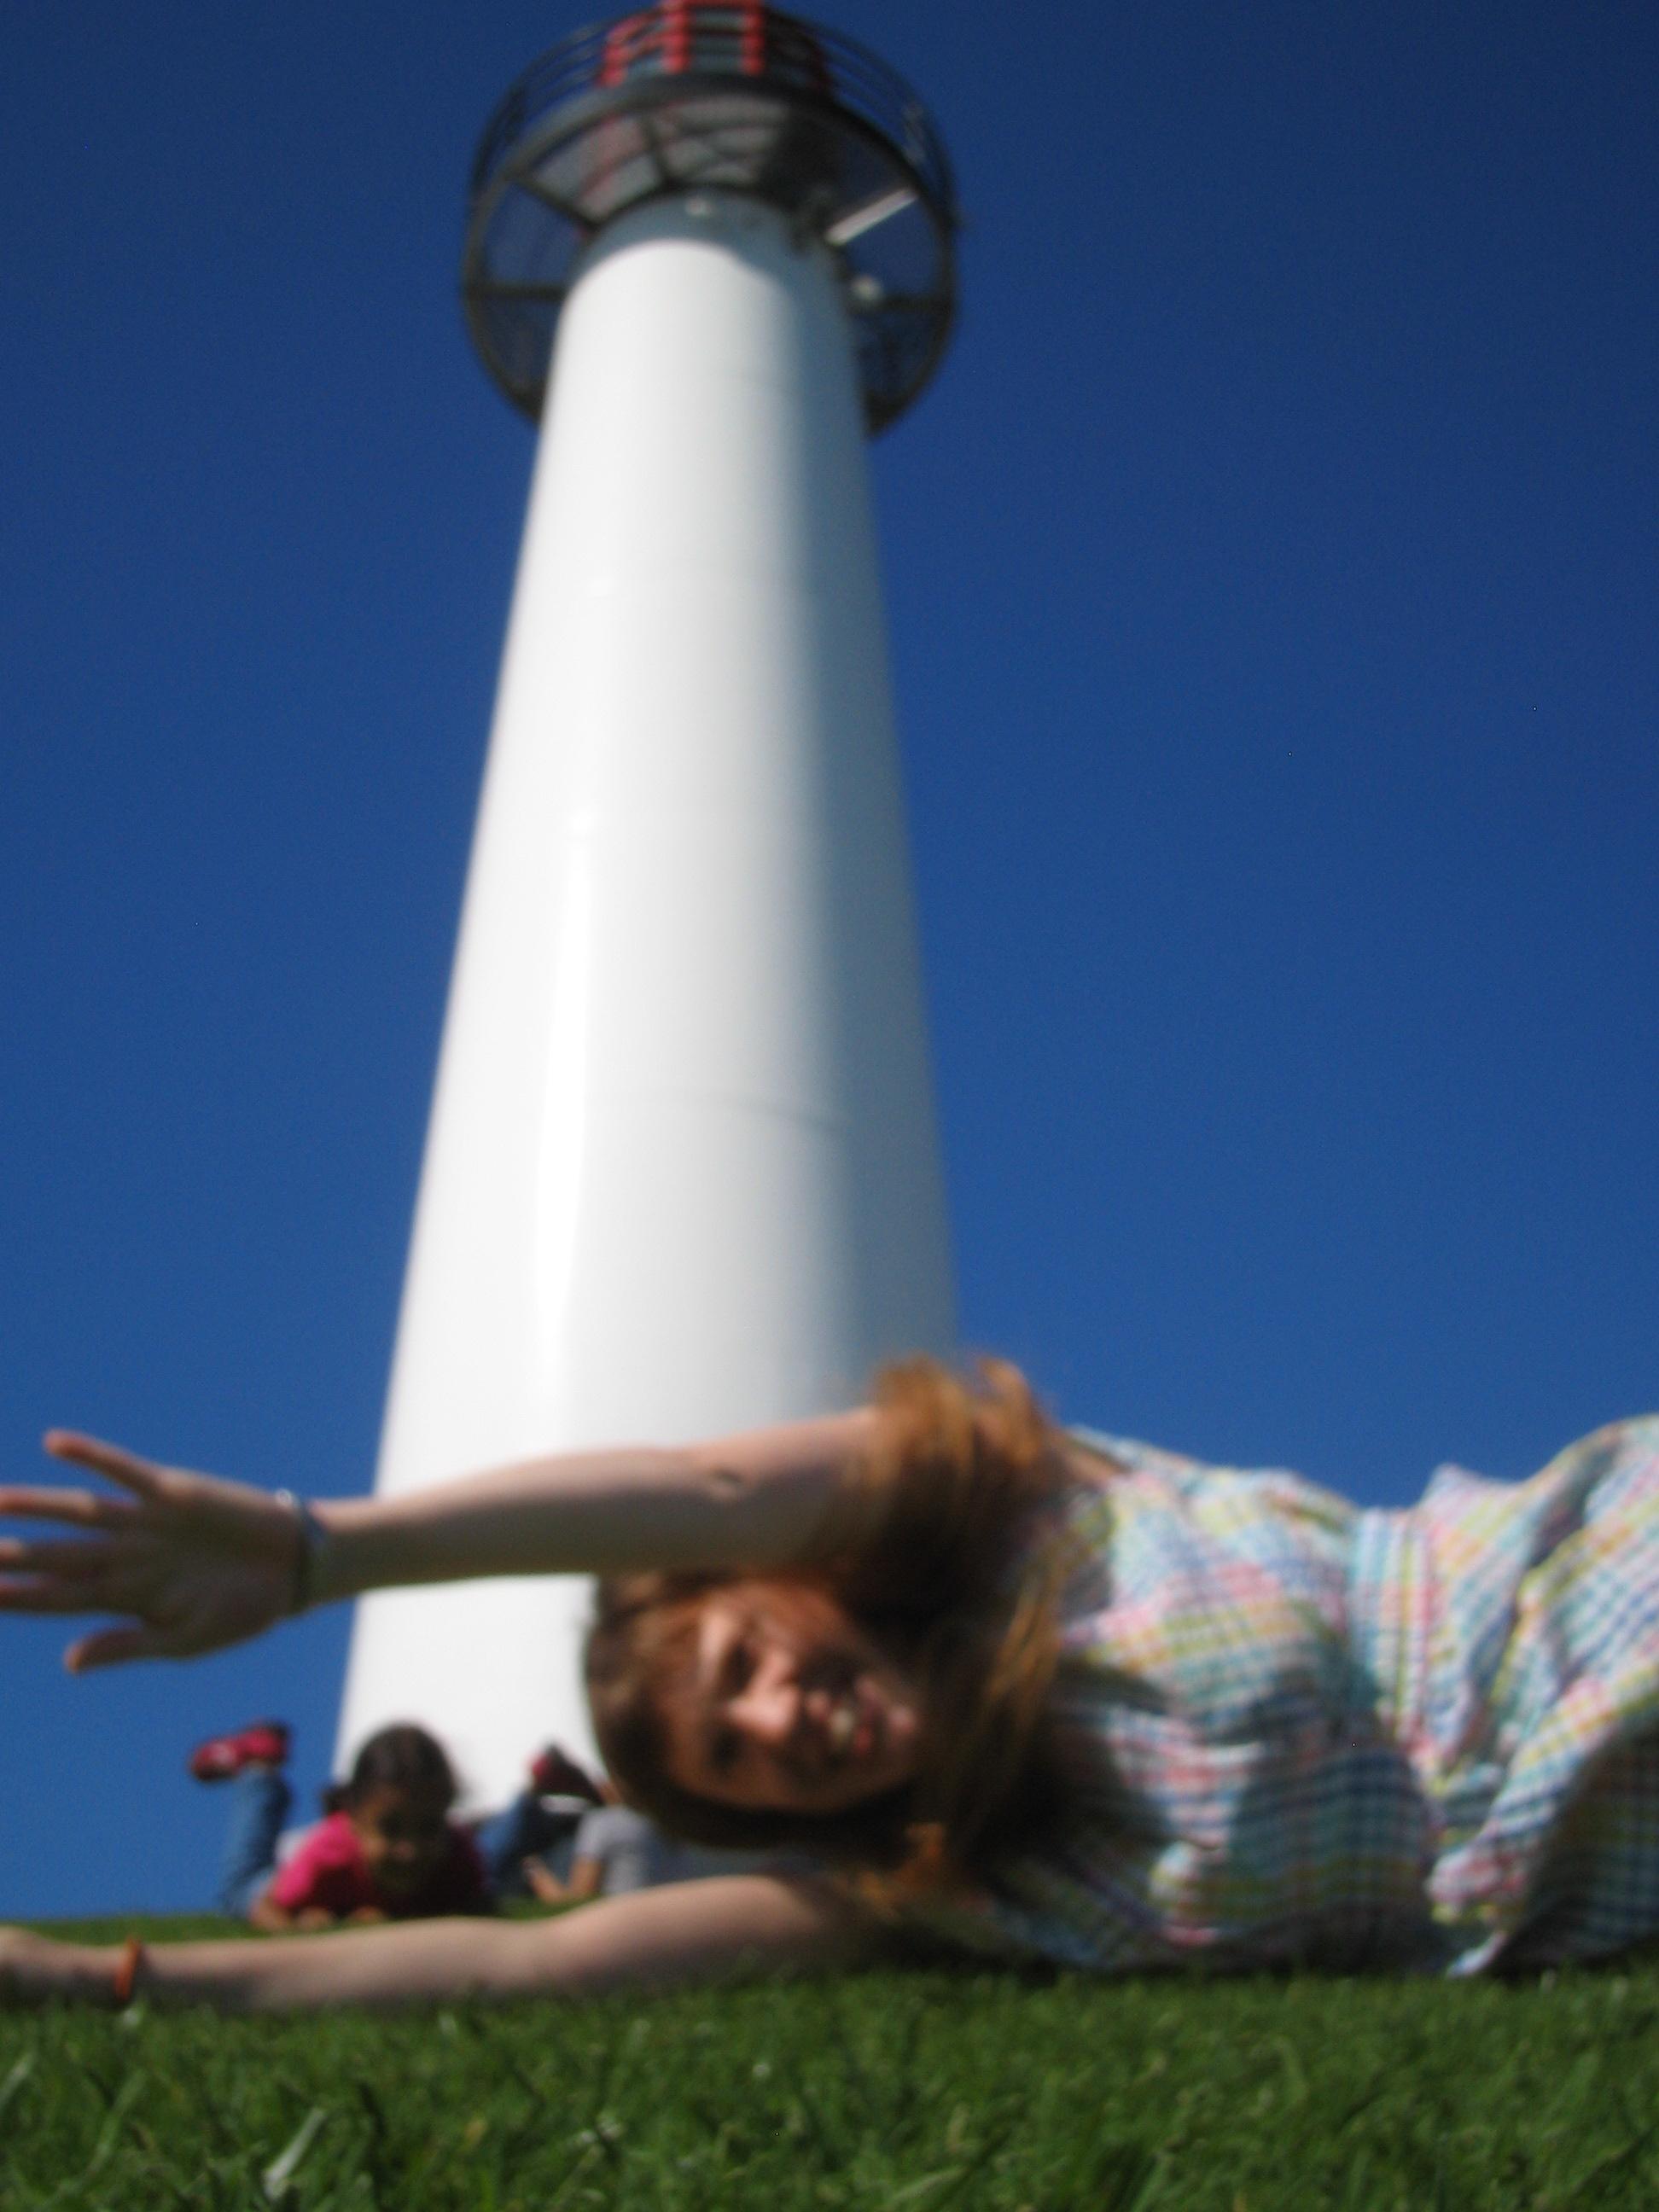 Virginia Shearer - rolls down the hill